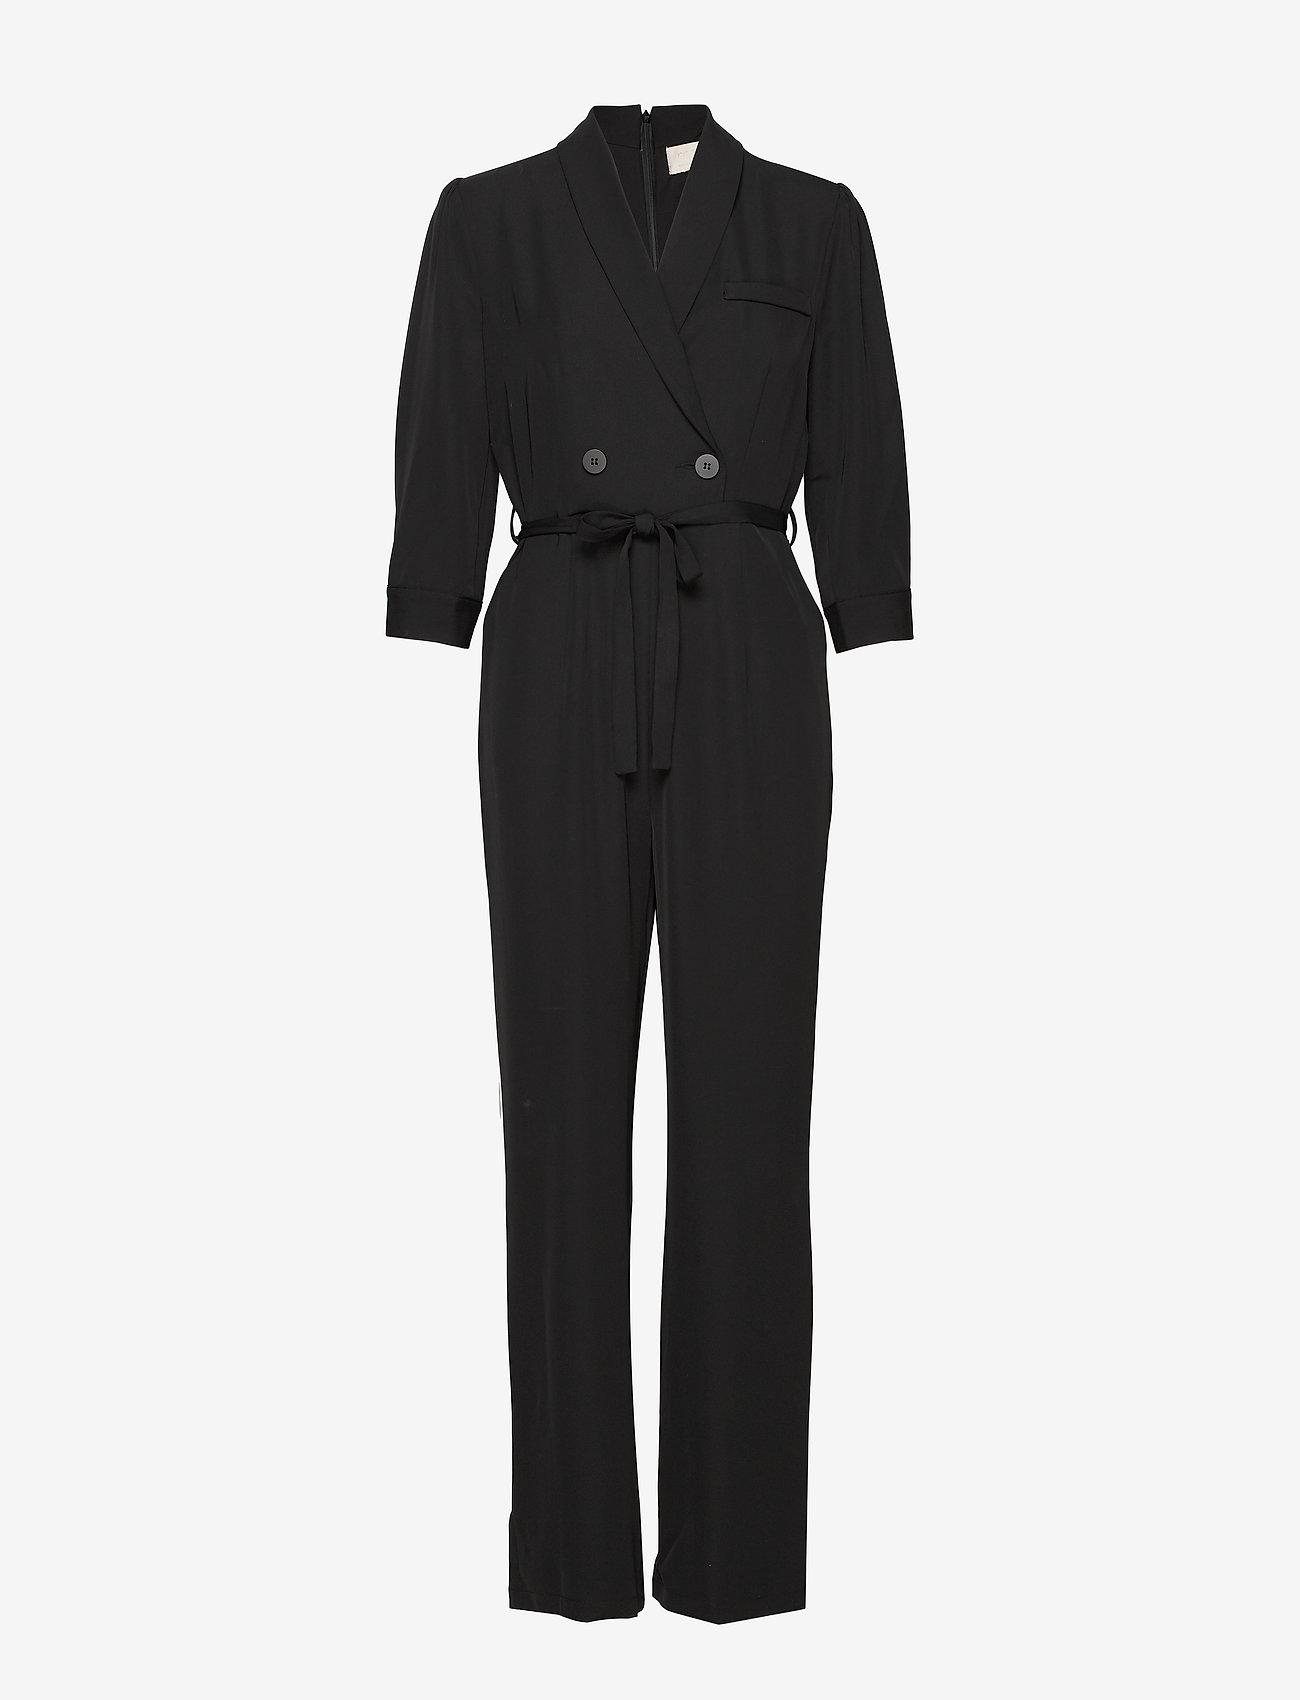 Minus - Violetta jumpsuit - jumpsuits - sort - 0